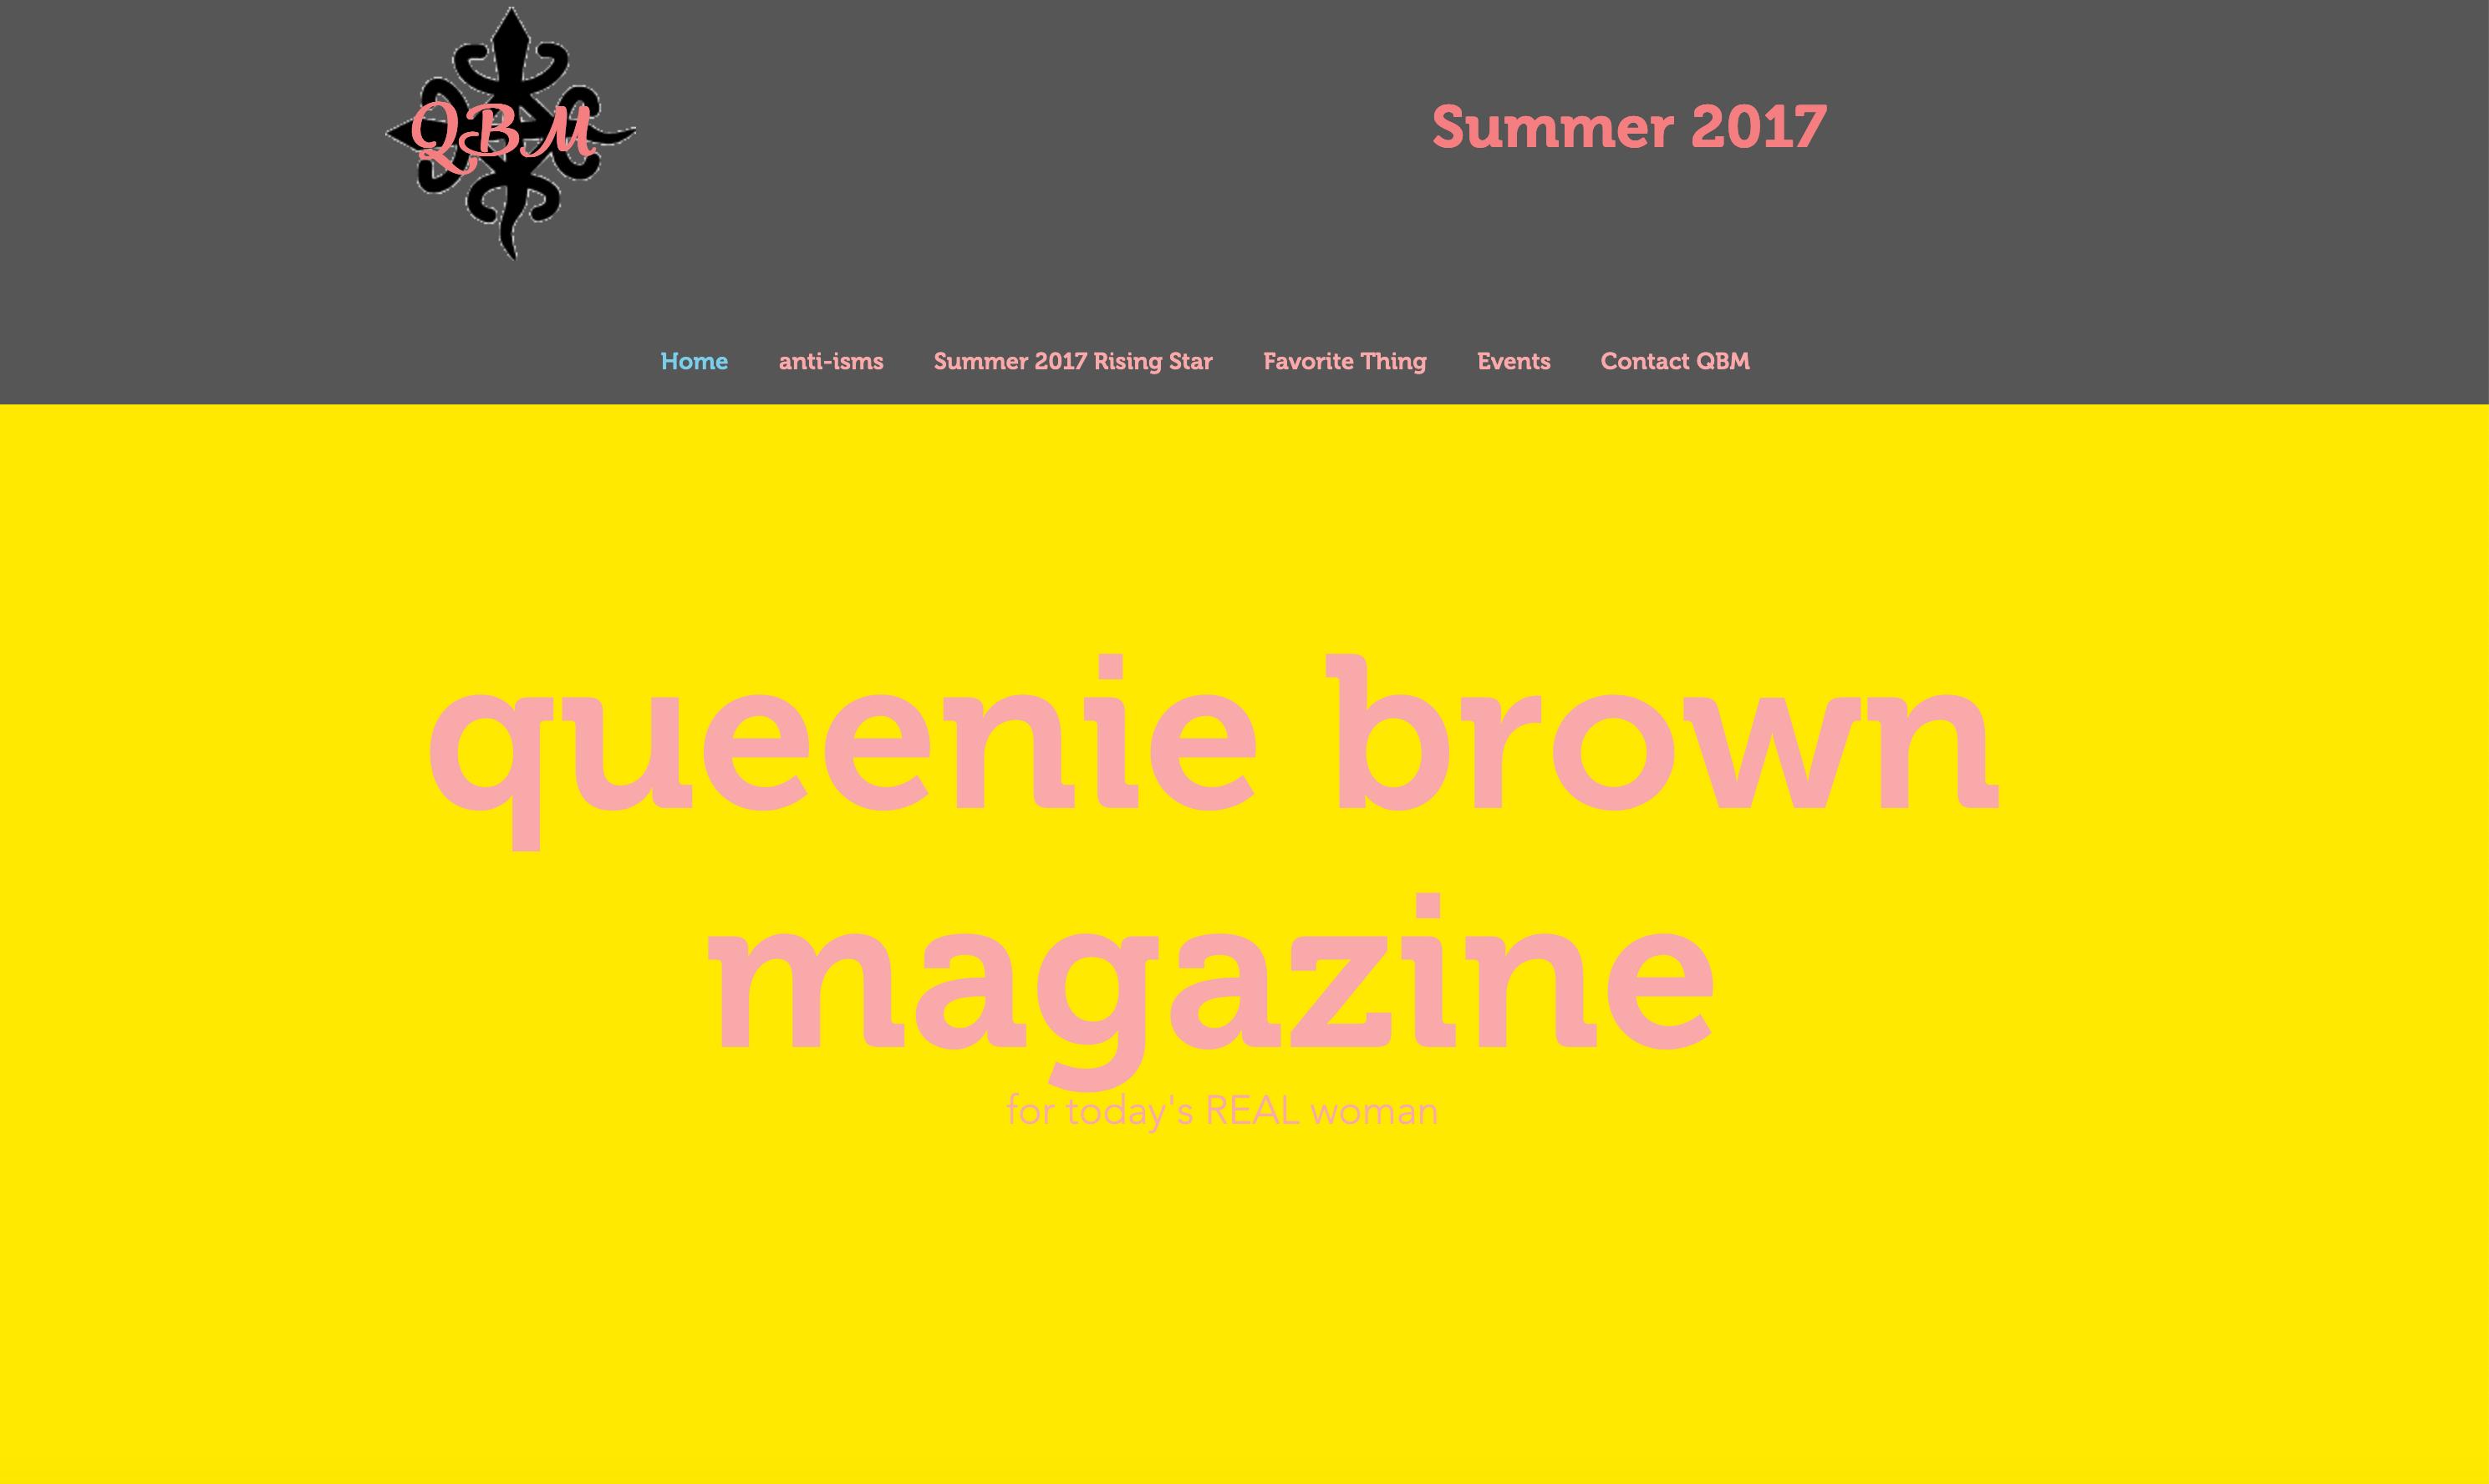 QBM Summer 2017